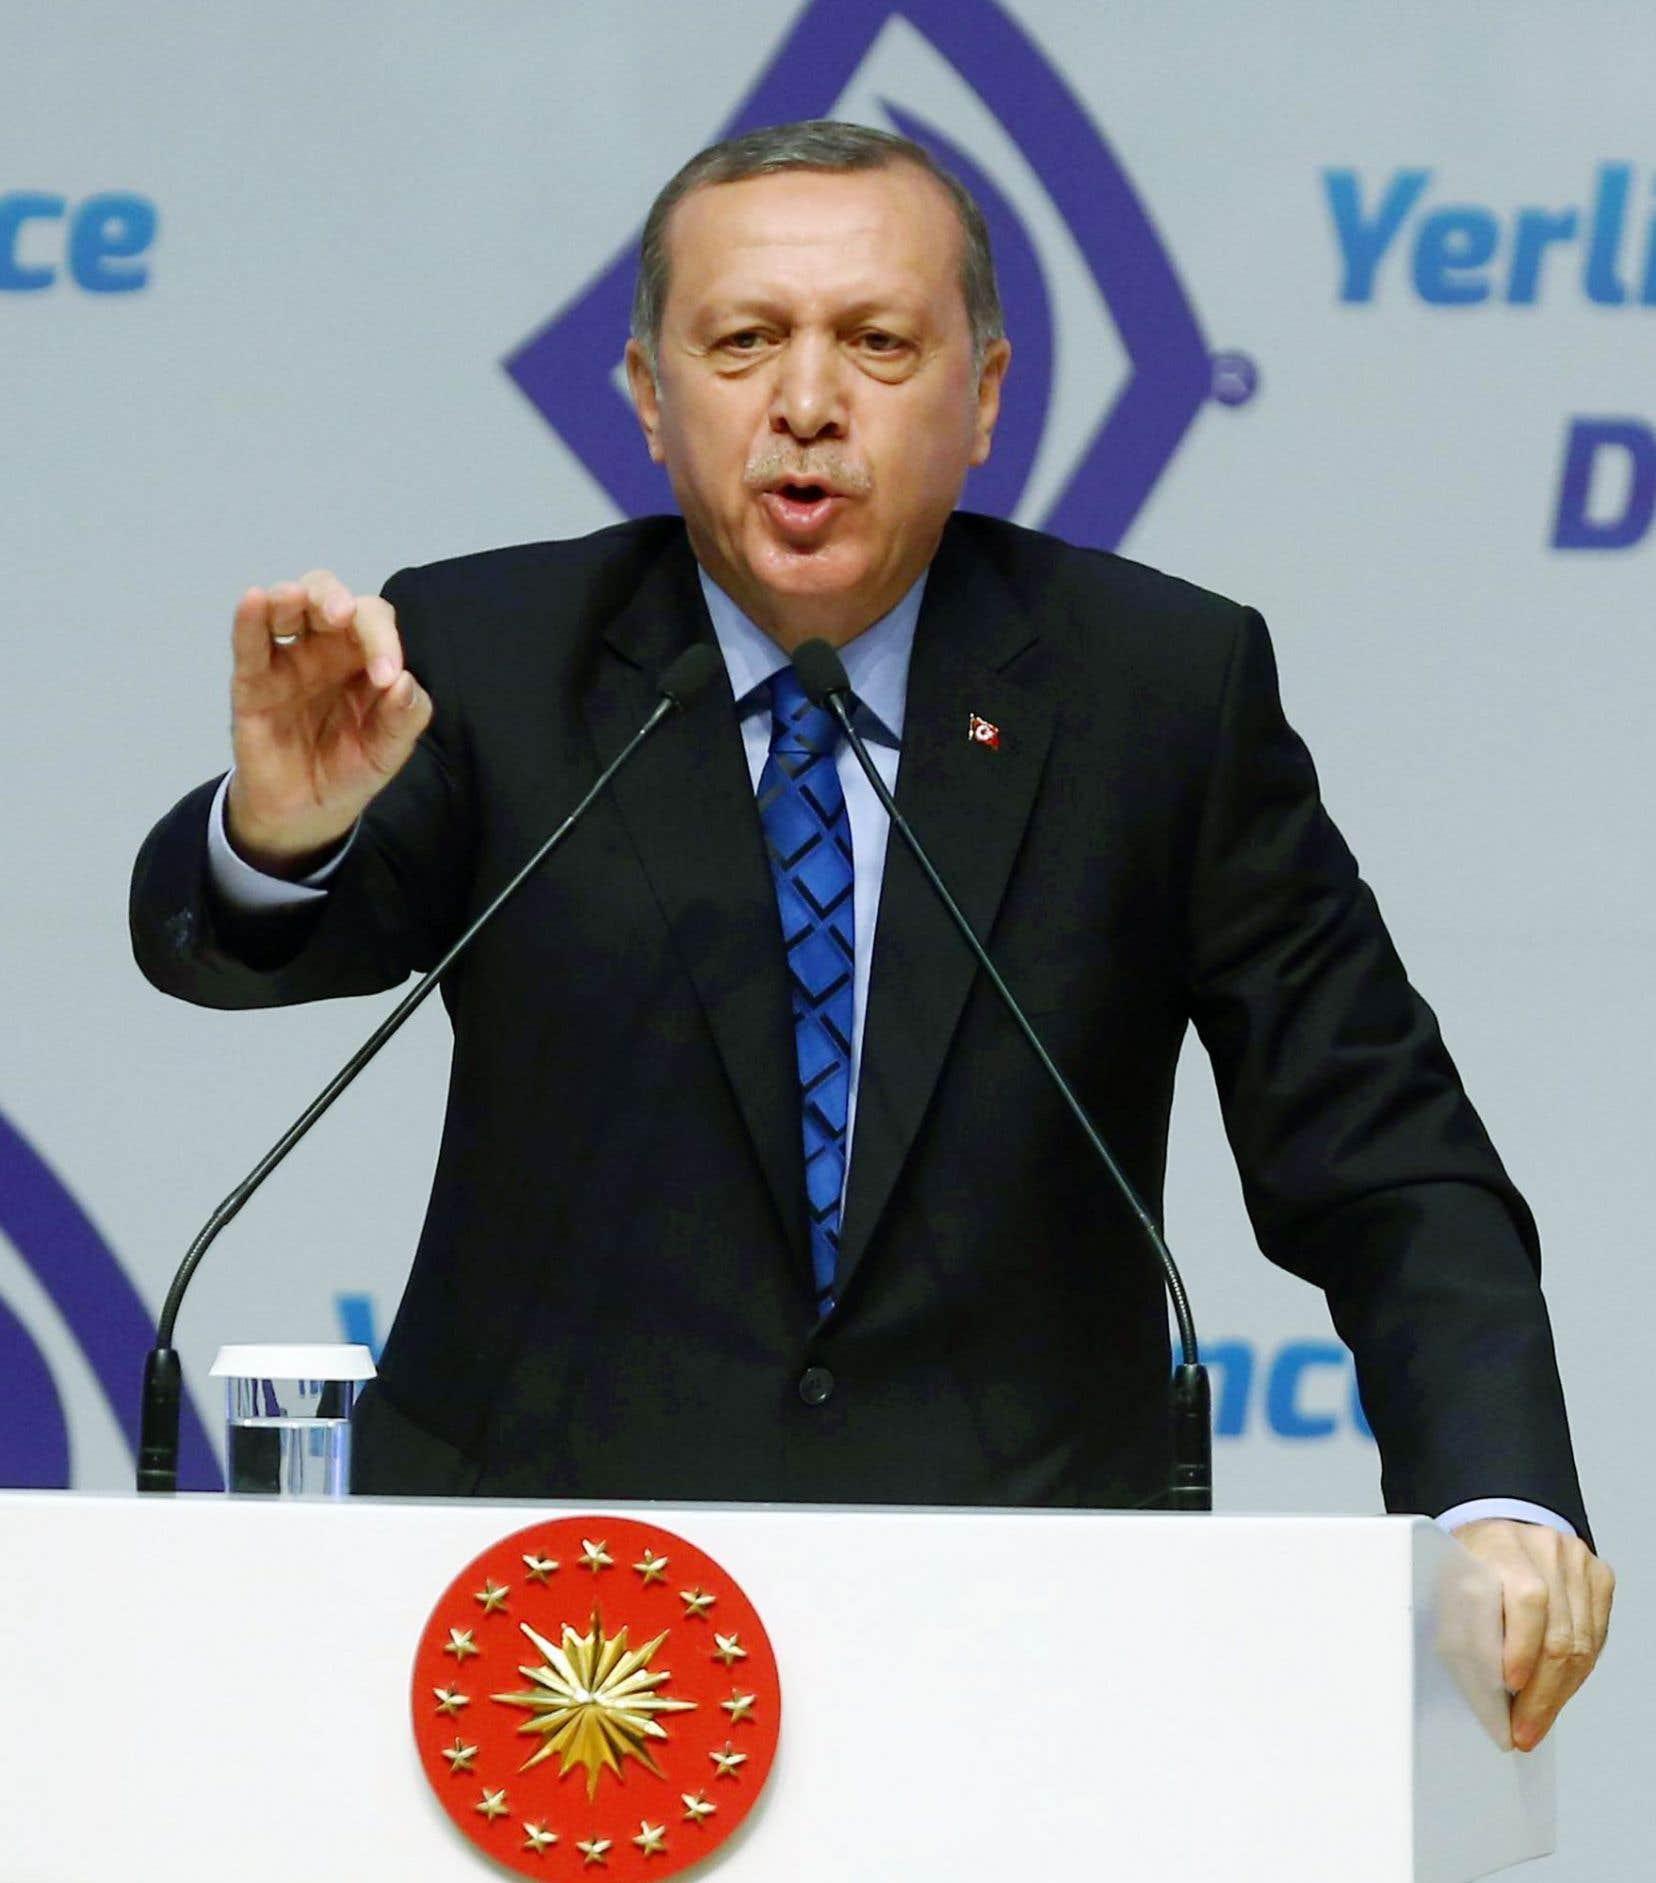 Le président de la Turquie, Recep Tayyip Erdogan